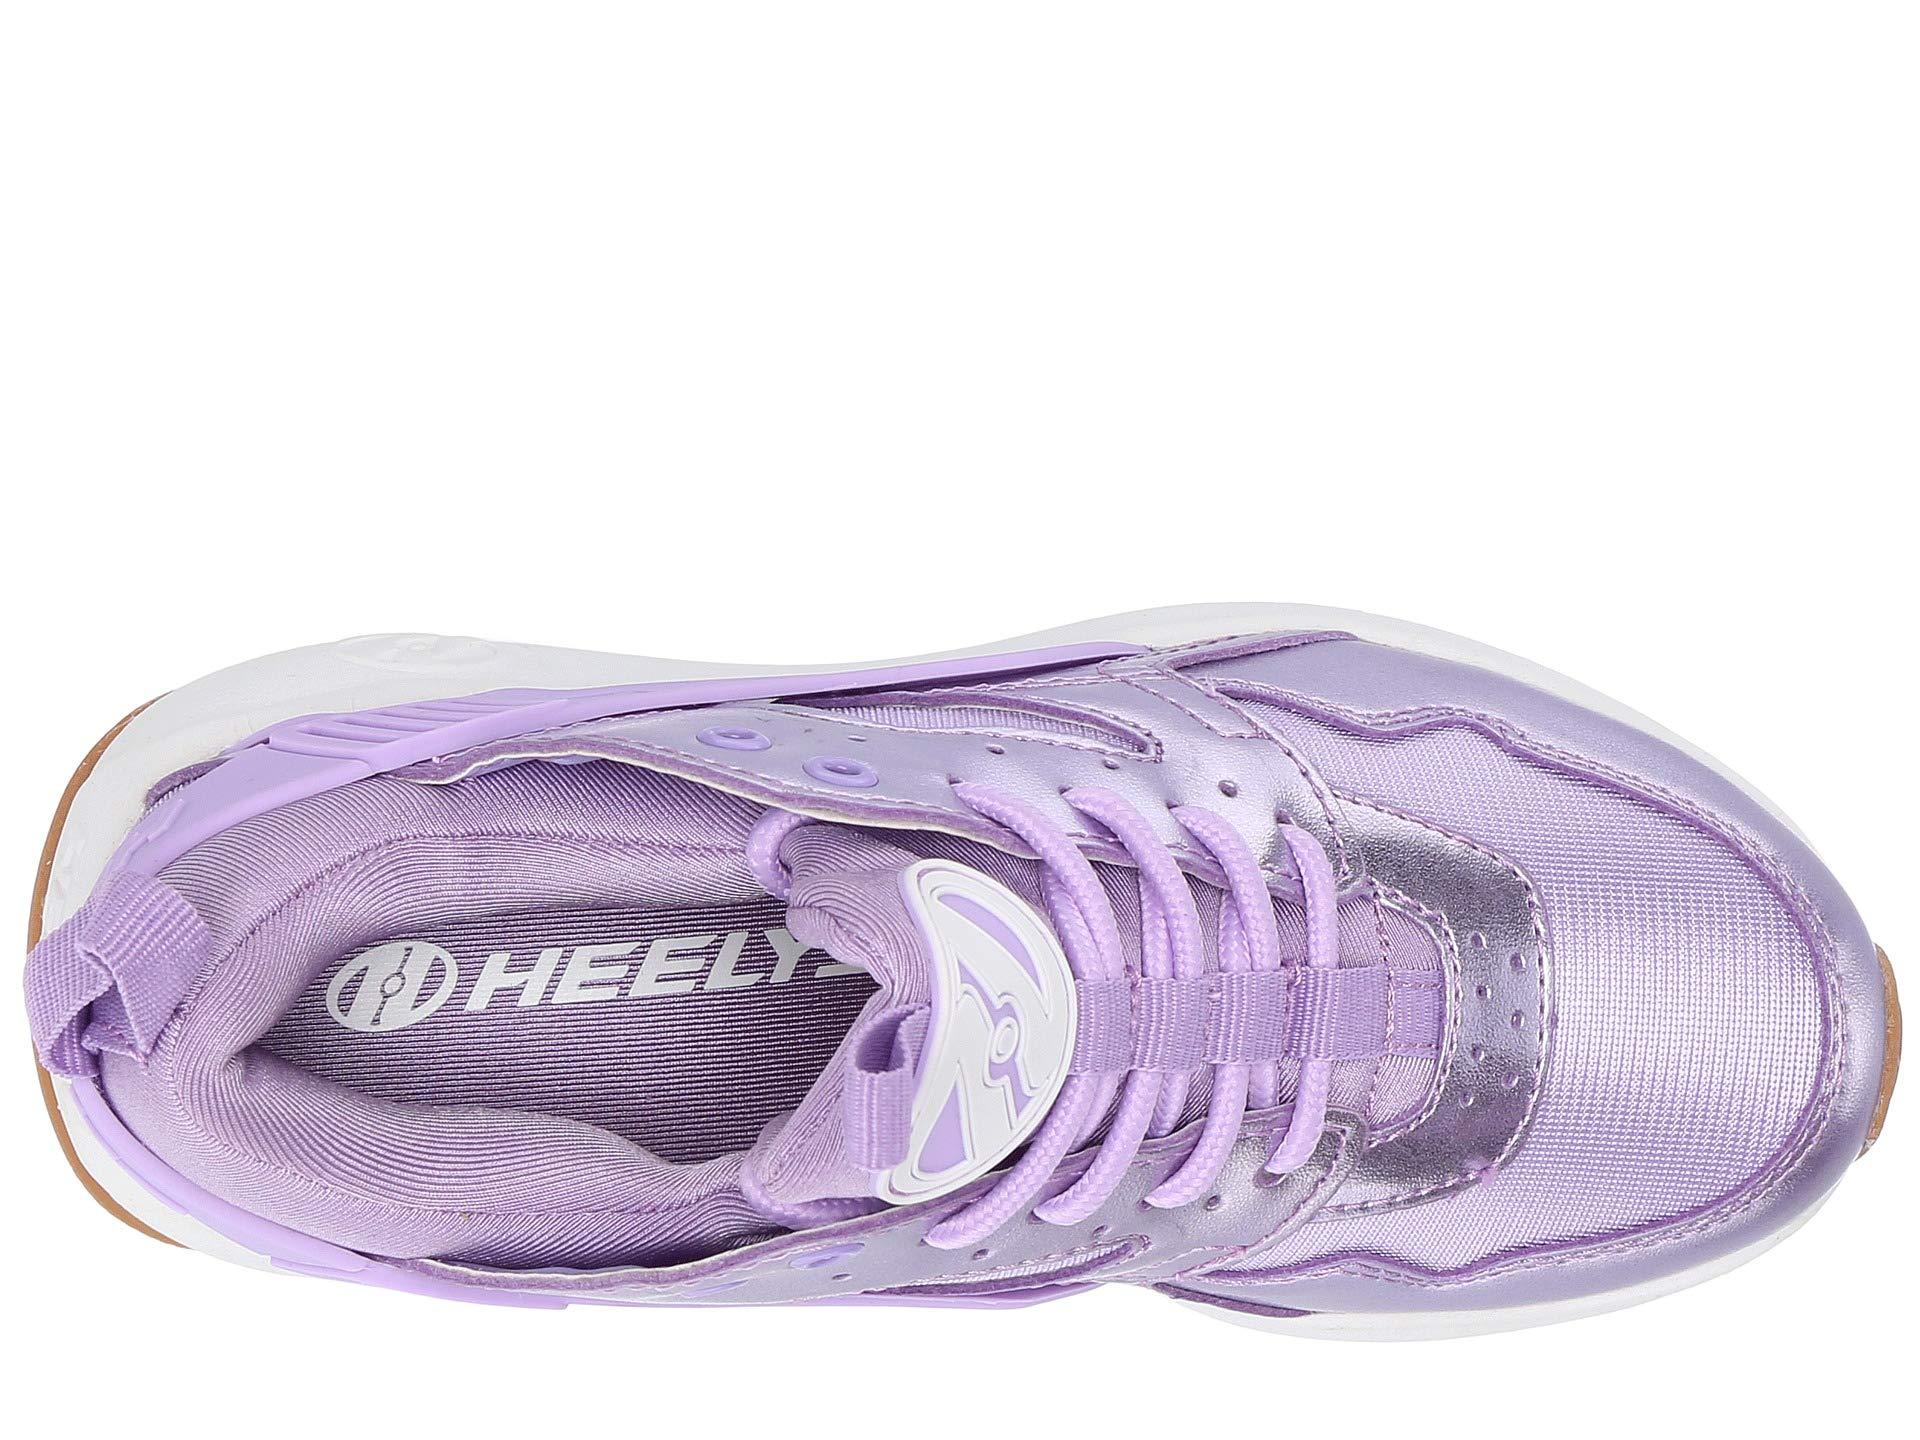 Heelys Girl's Force (Little Kid/Big Kid/Adult) Lilac/Metallic 8 M US M by Heelys (Image #9)